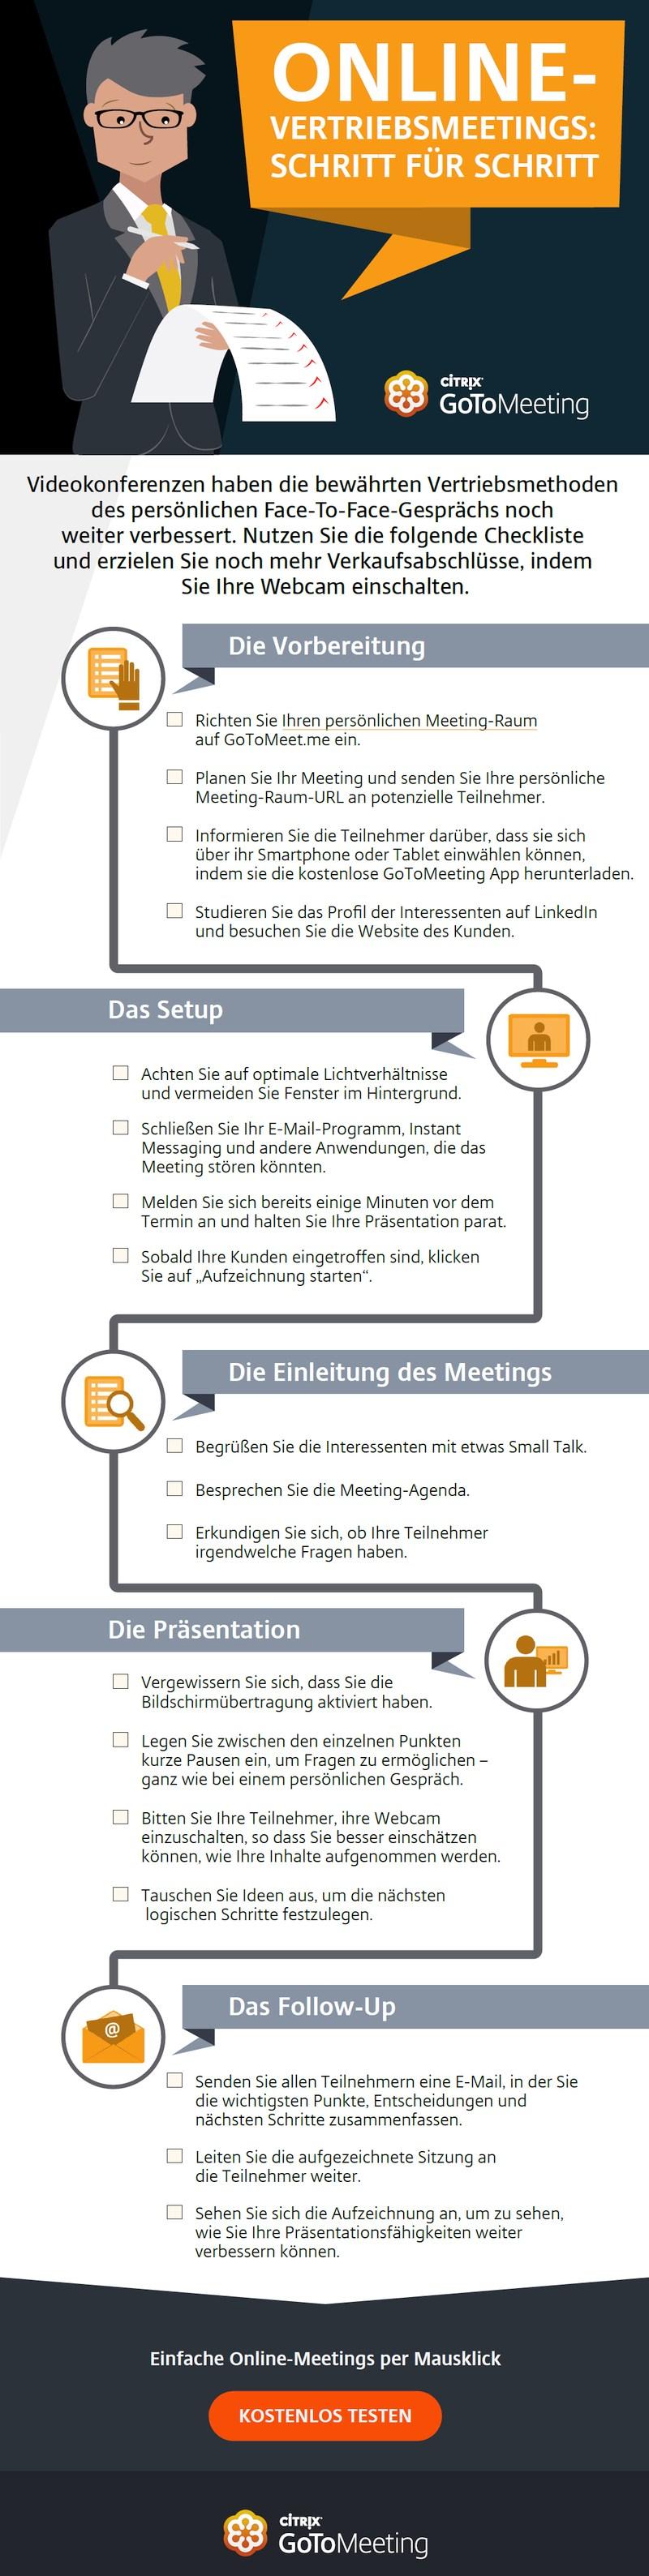 infografik citrix online-vertriebsmeeting